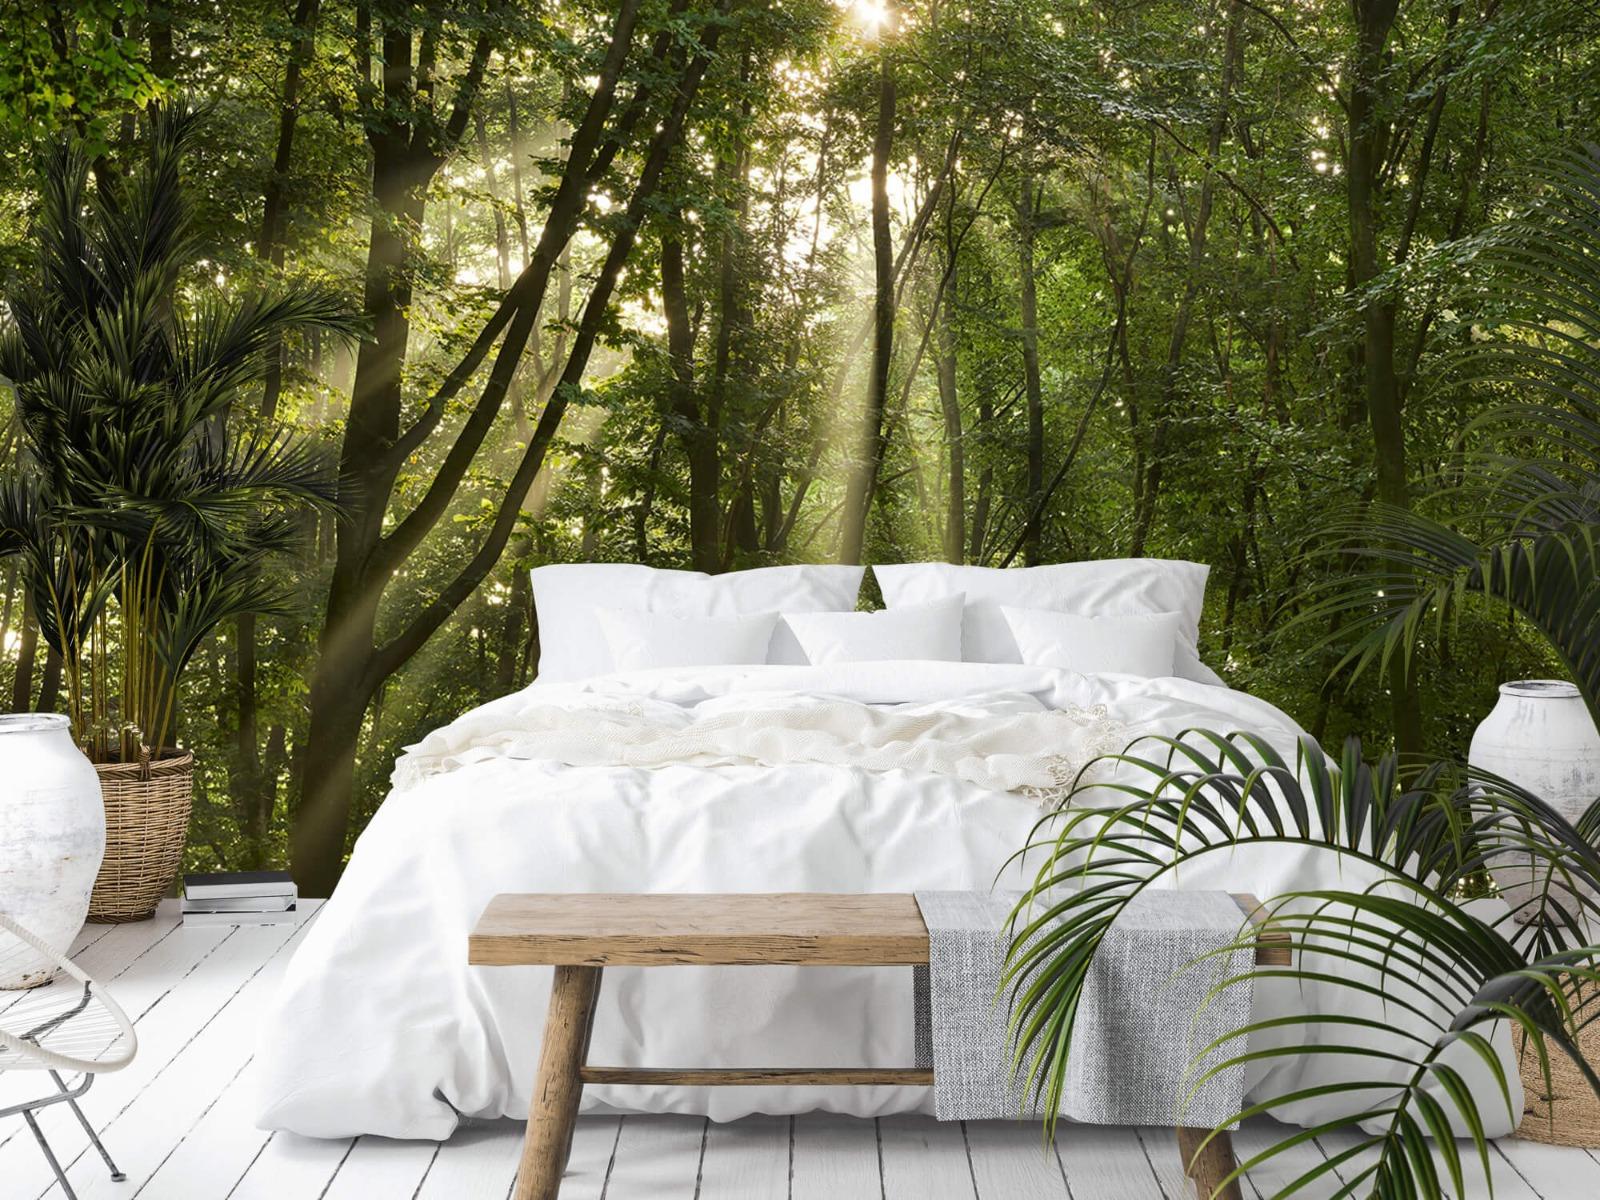 Bomen - Zonnestralen in het bos - Slaapkamer 13